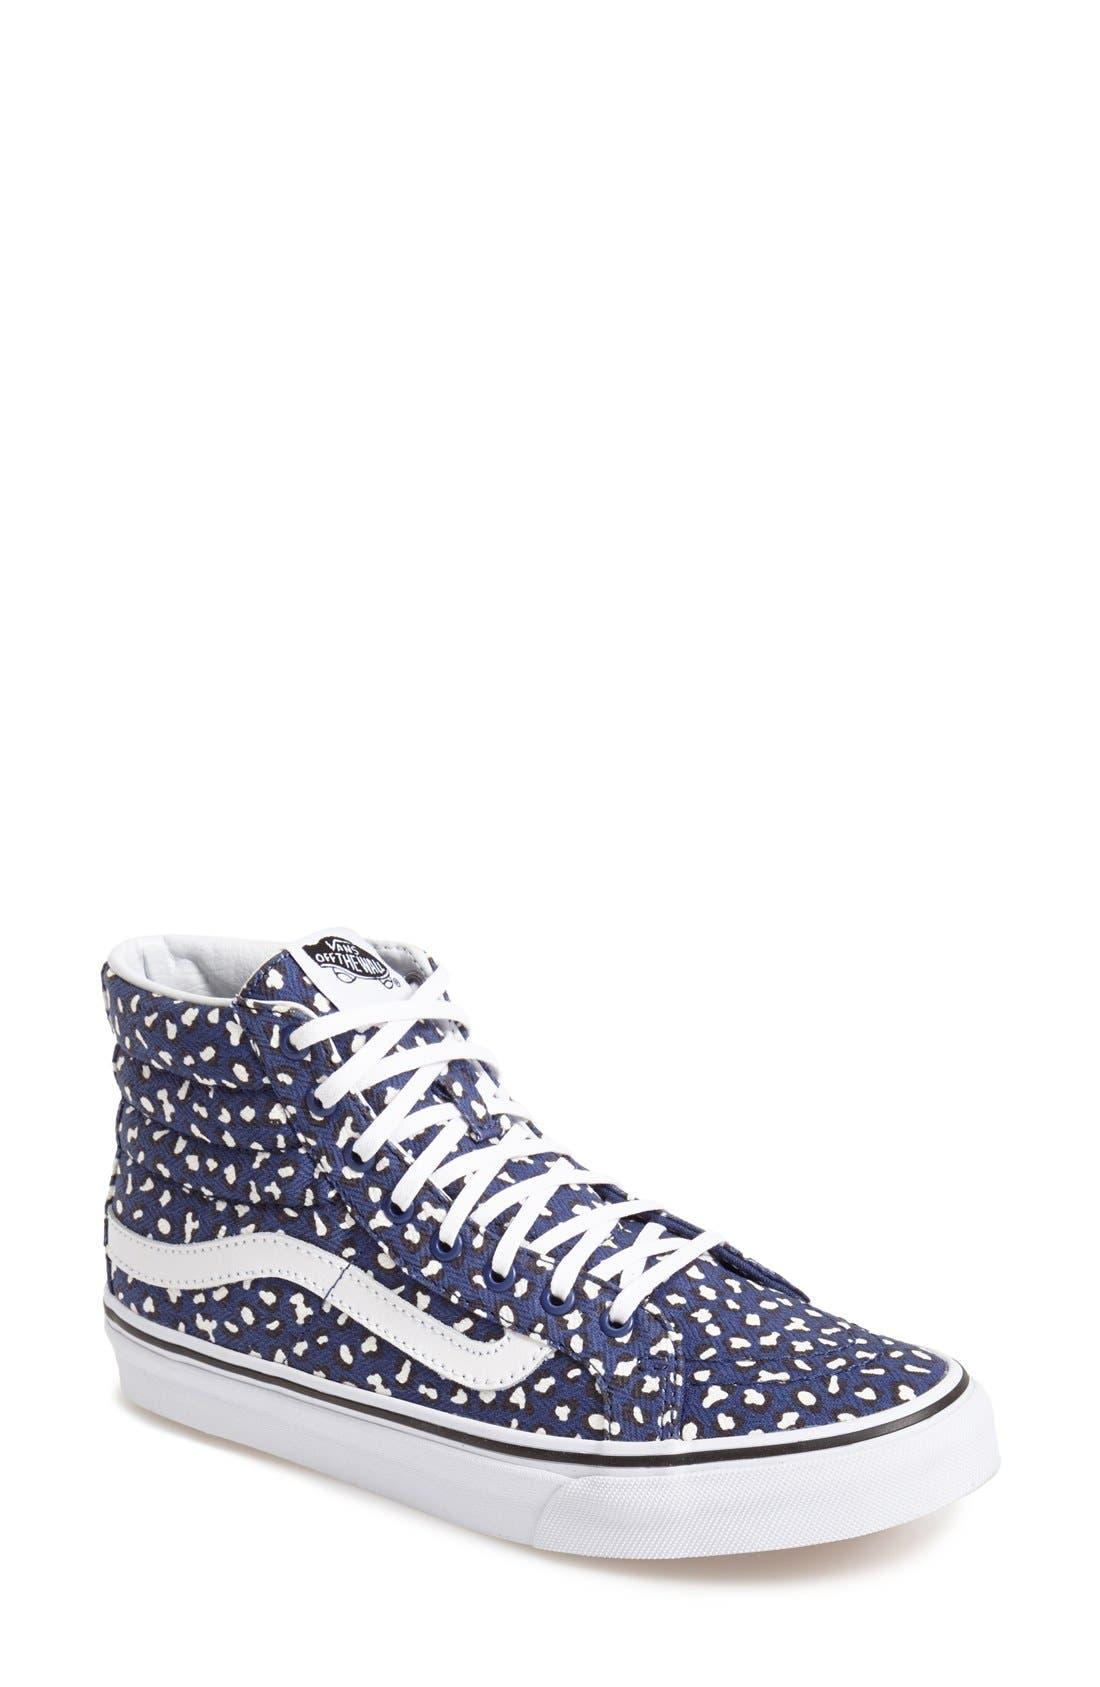 Alternate Image 1 Selected - Vans 'Herringbone Leopard - Sk8-Hi Slim' Sneaker (Women)